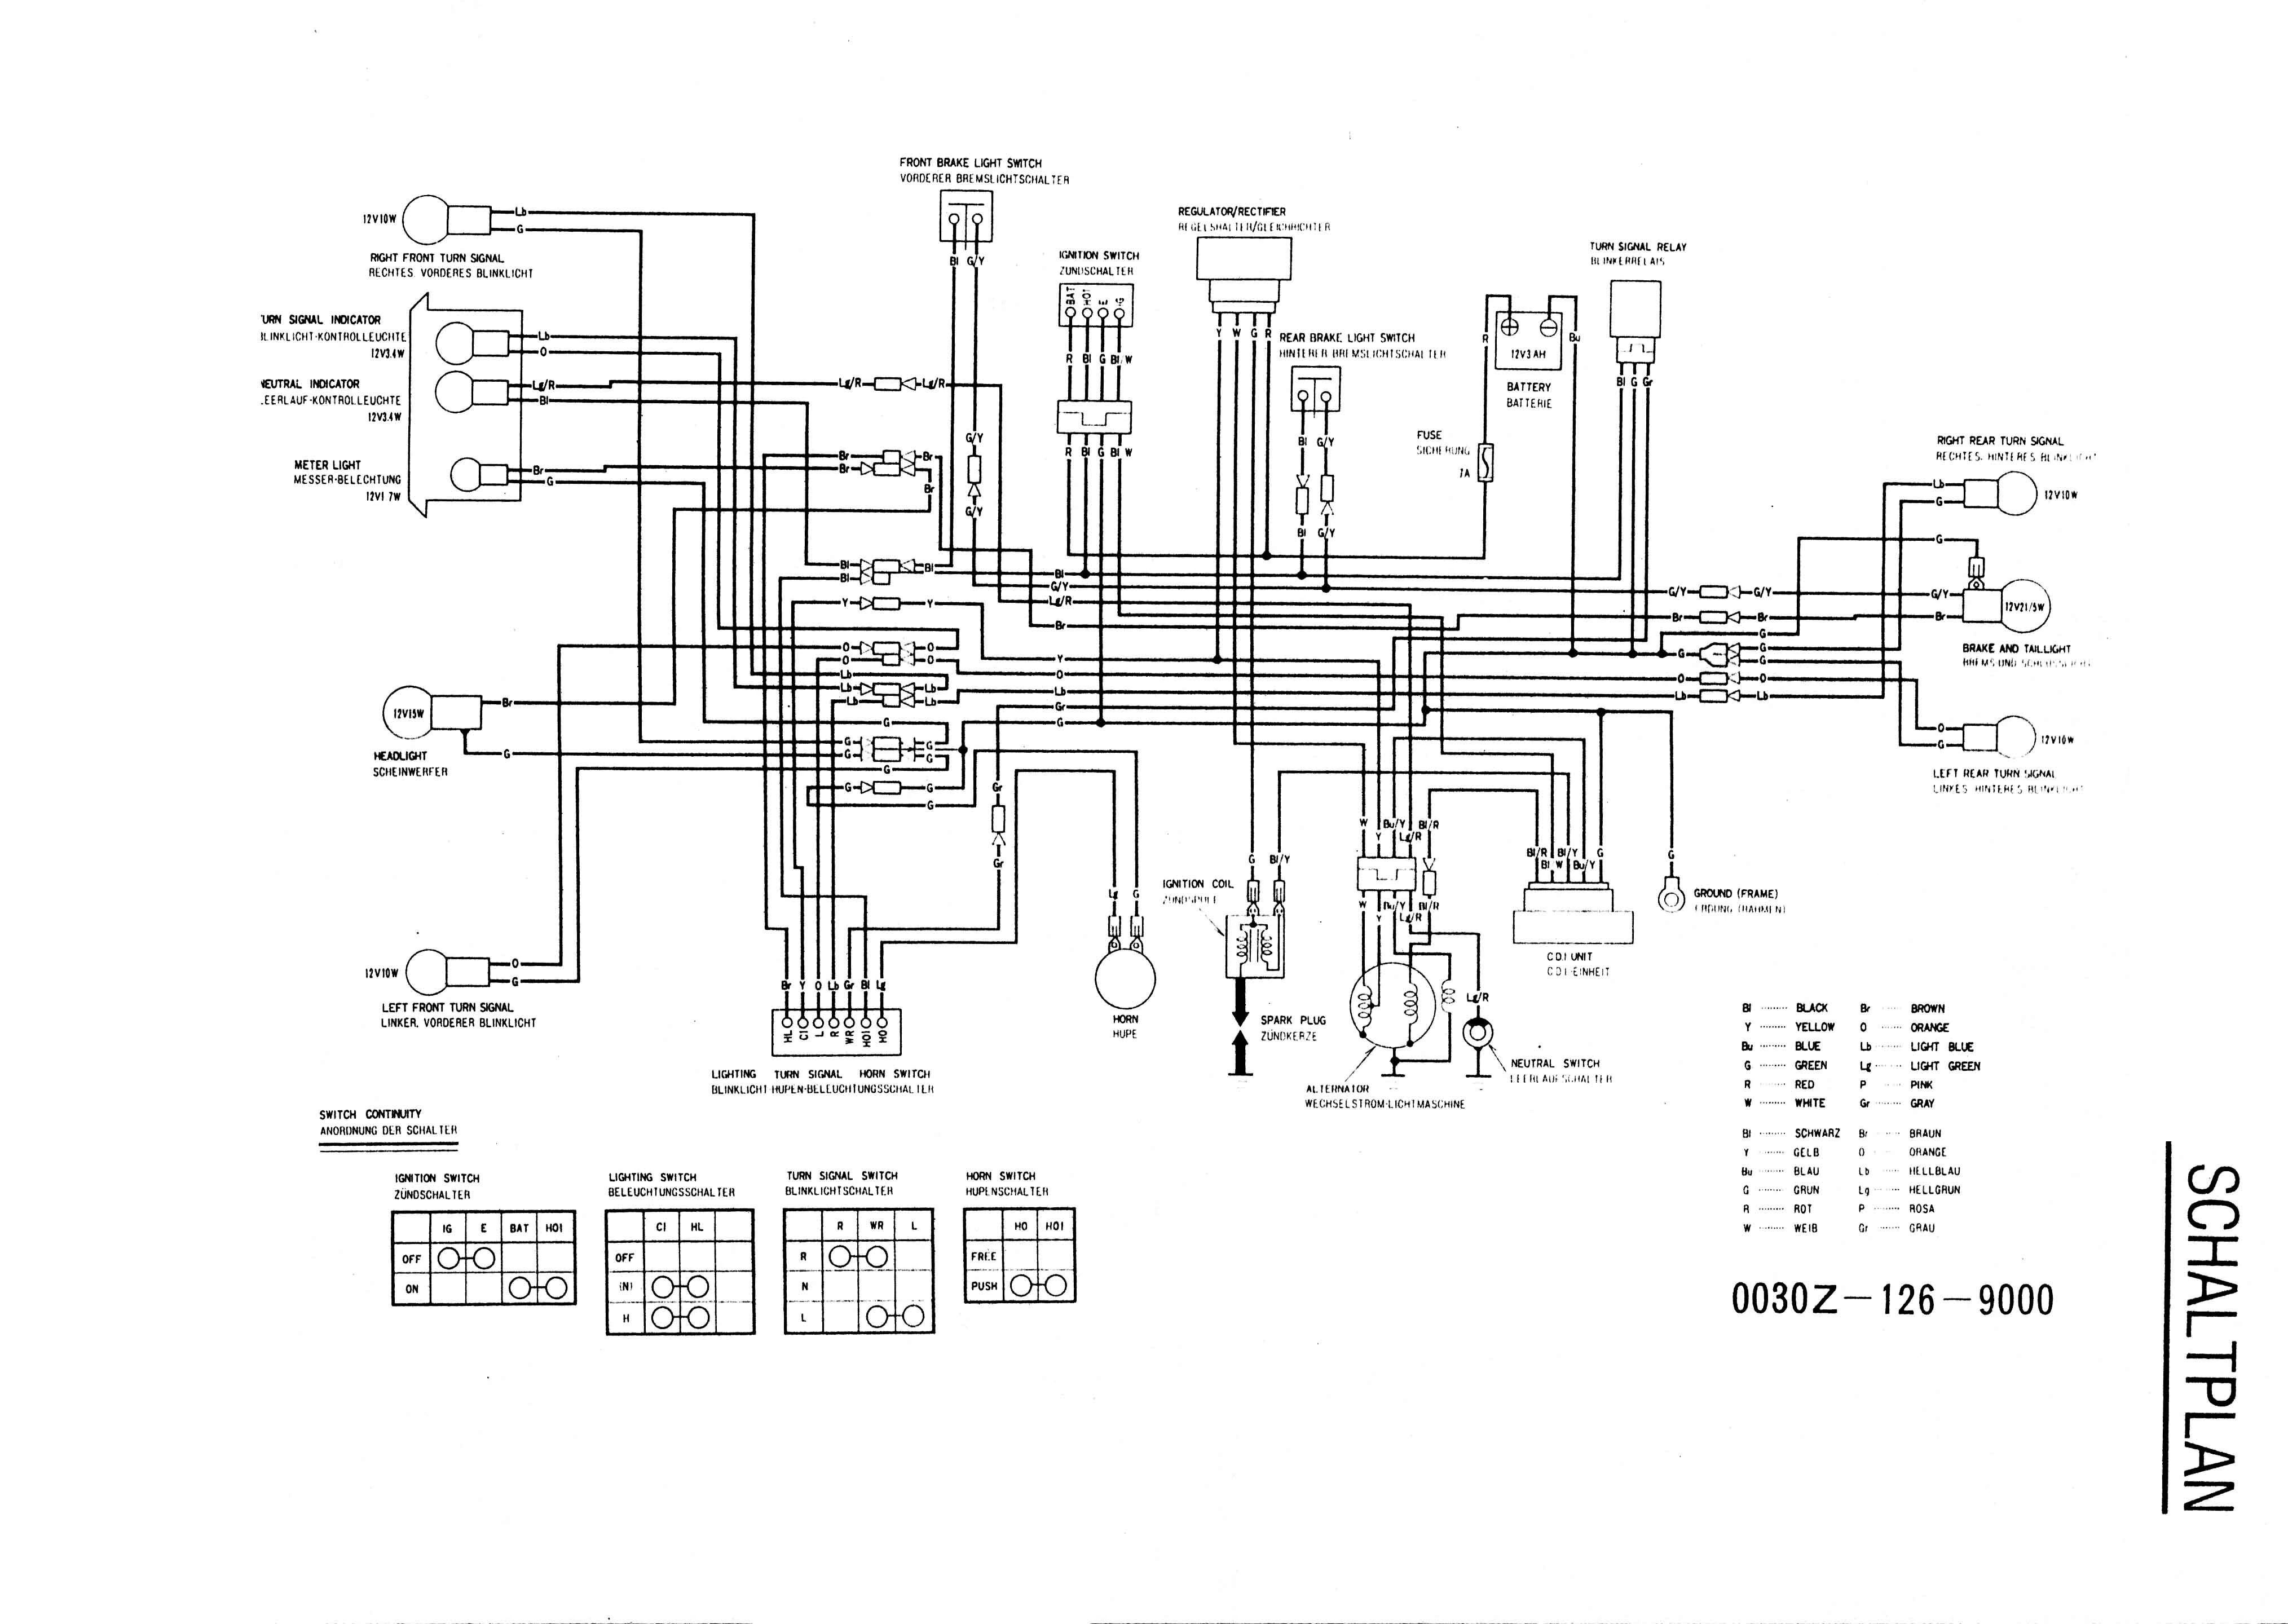 Honda St70 Wiring Diagram